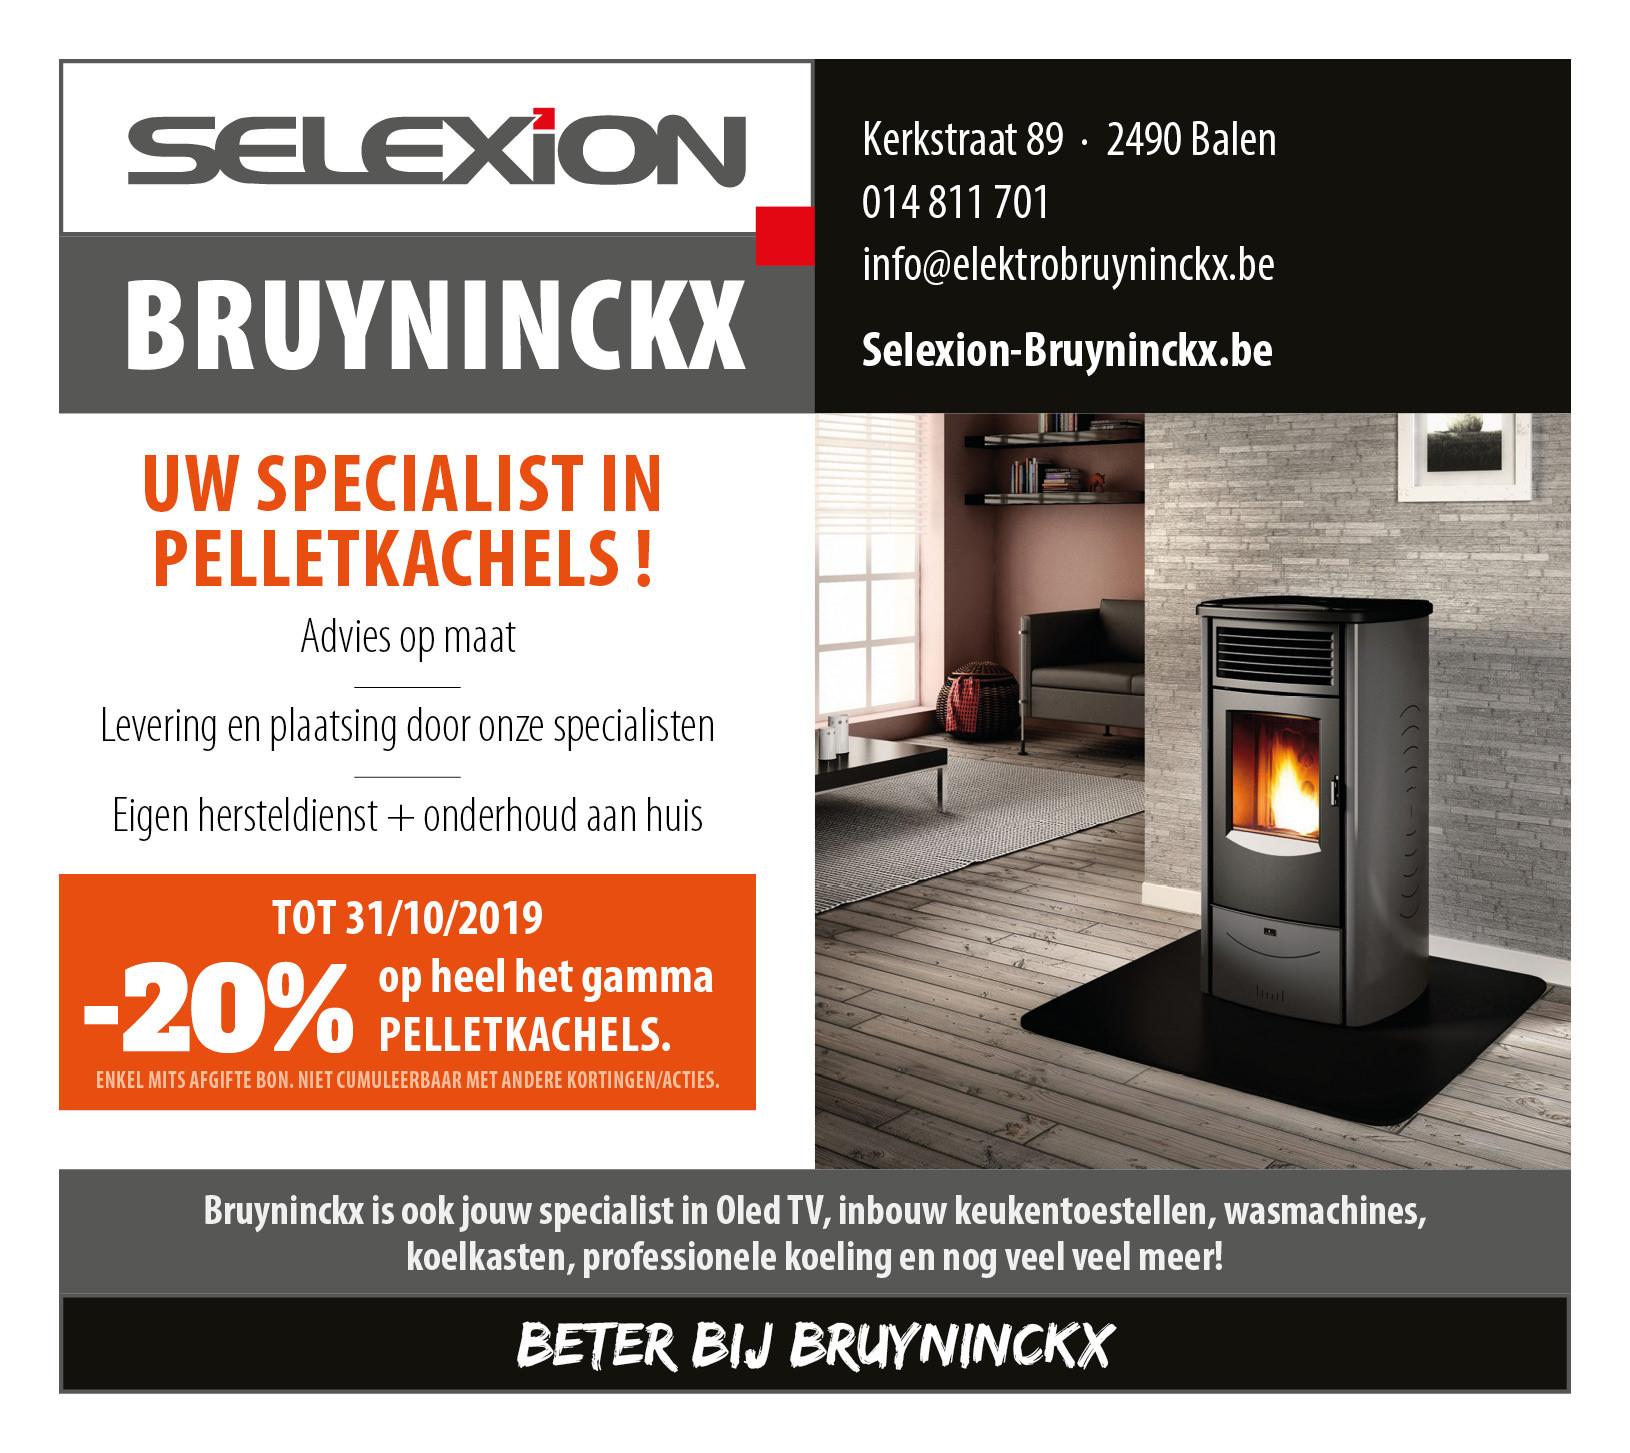 selexion bruyninckx